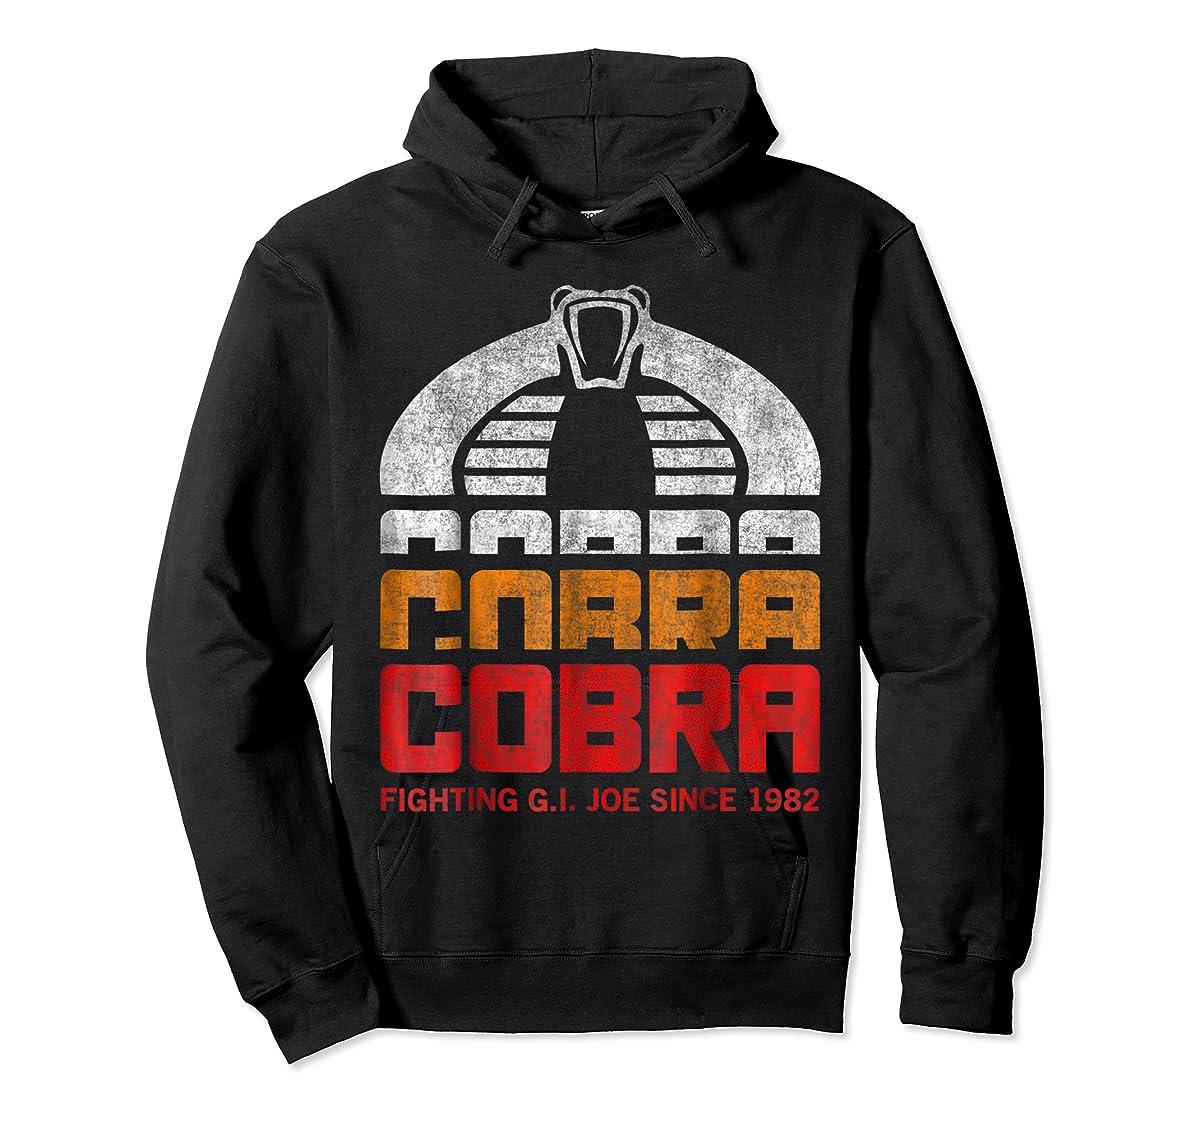 G.I. Joe Retro Cobra Fighting Since 1982 T-Shirt-Hoodie-Black